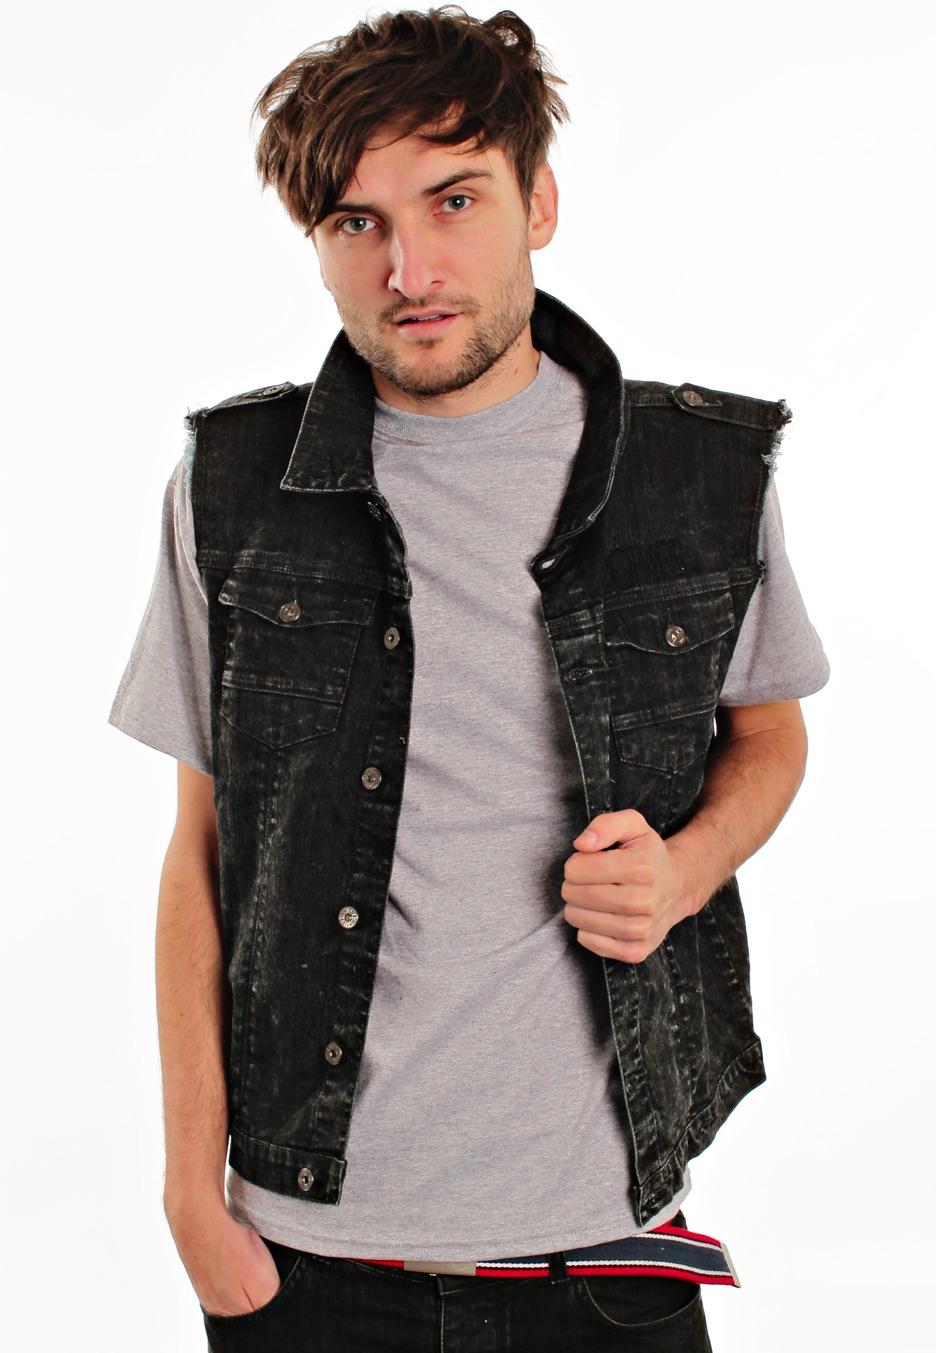 black vest and jeans - photo #45